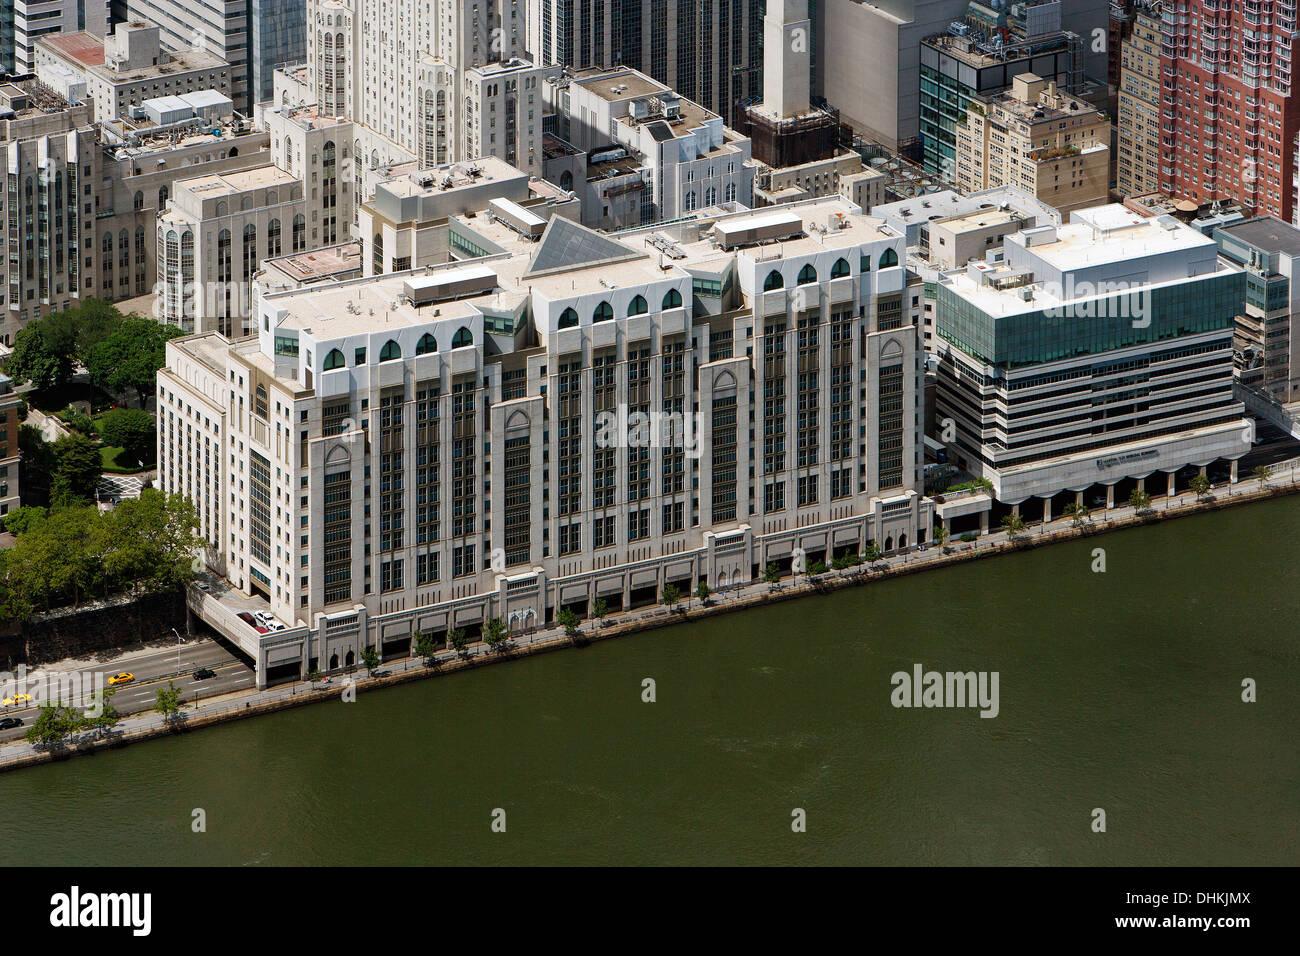 aerial photograph East River Esplanade Hospital for Special Surgery, Manhattan, New York City - Stock Image